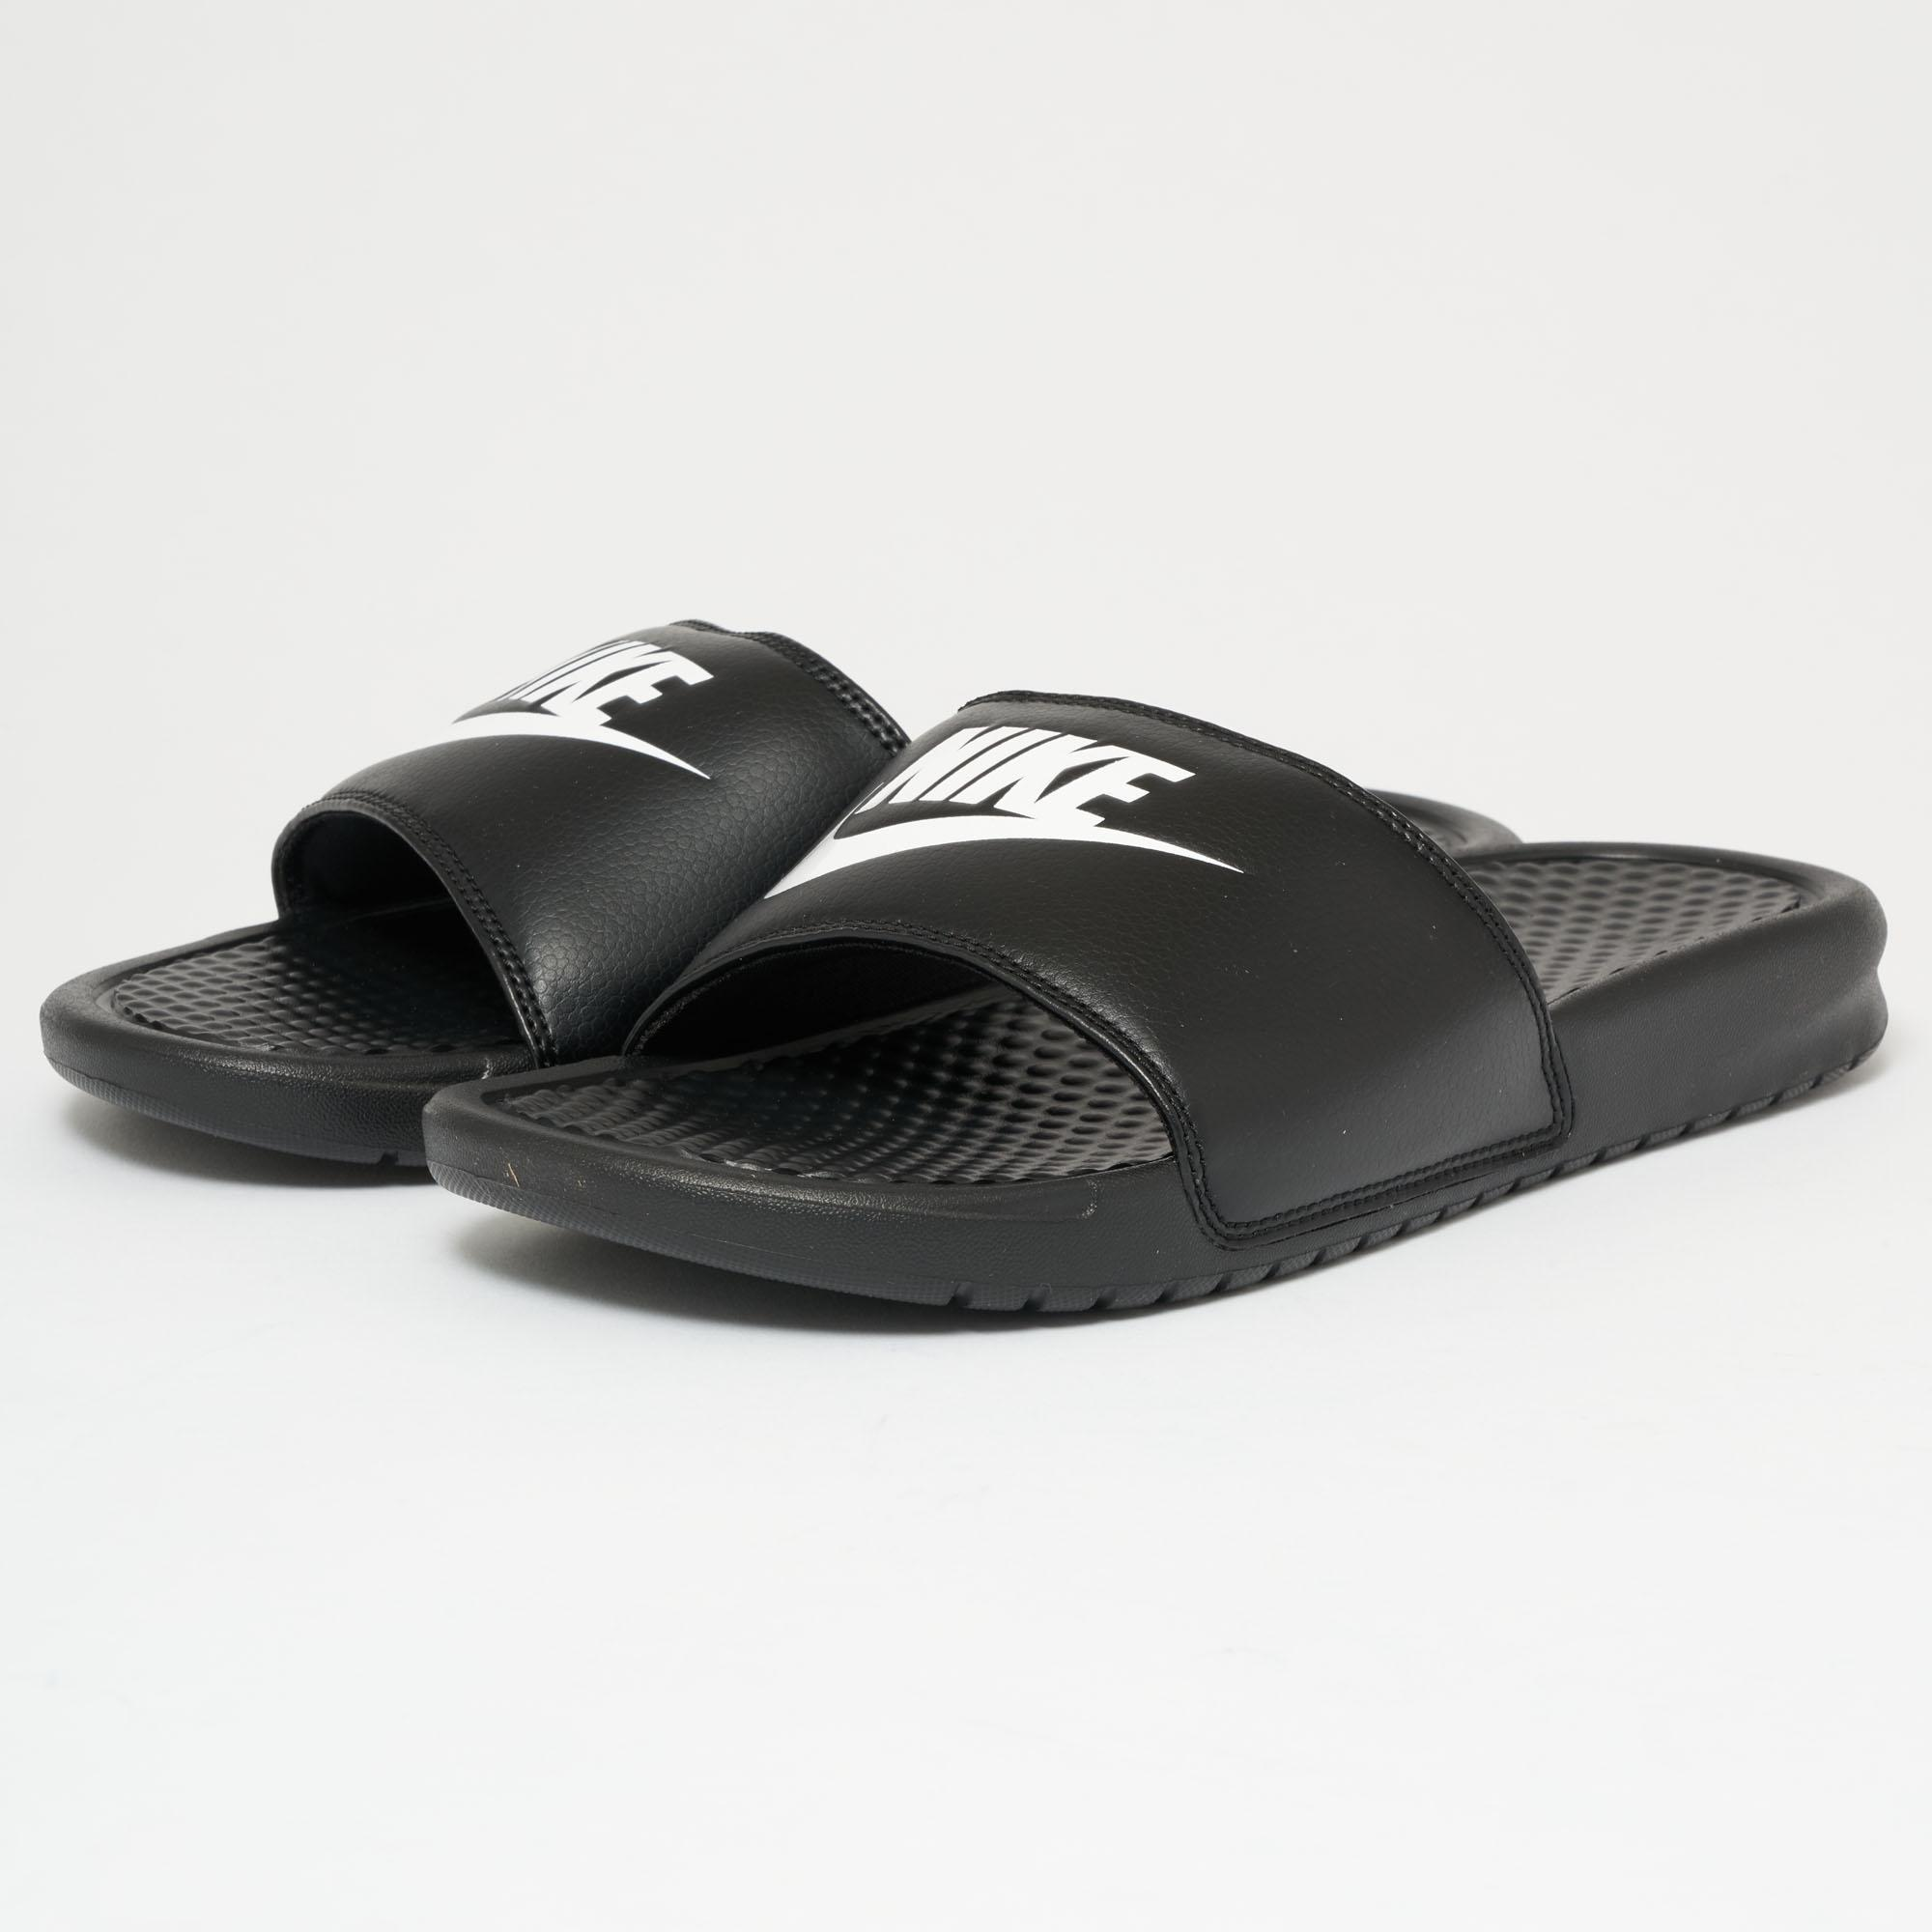 95f8afcbbdd8 Nike - Benassi Jdi Slides - Black   White - Lyst. View fullscreen